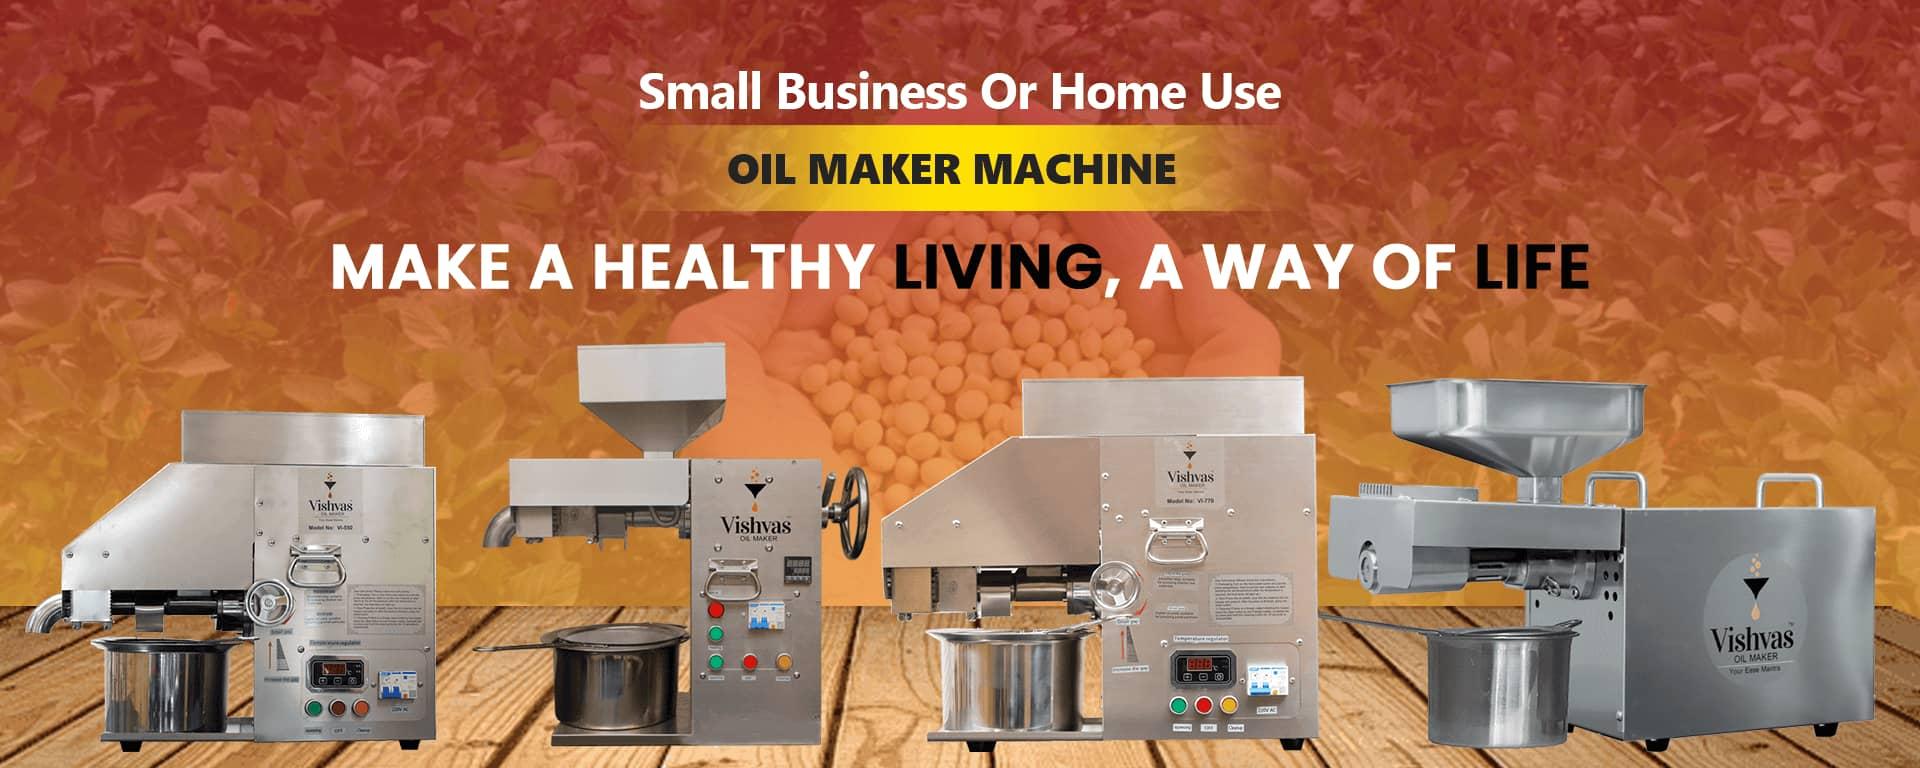 Mini commercial oil machine